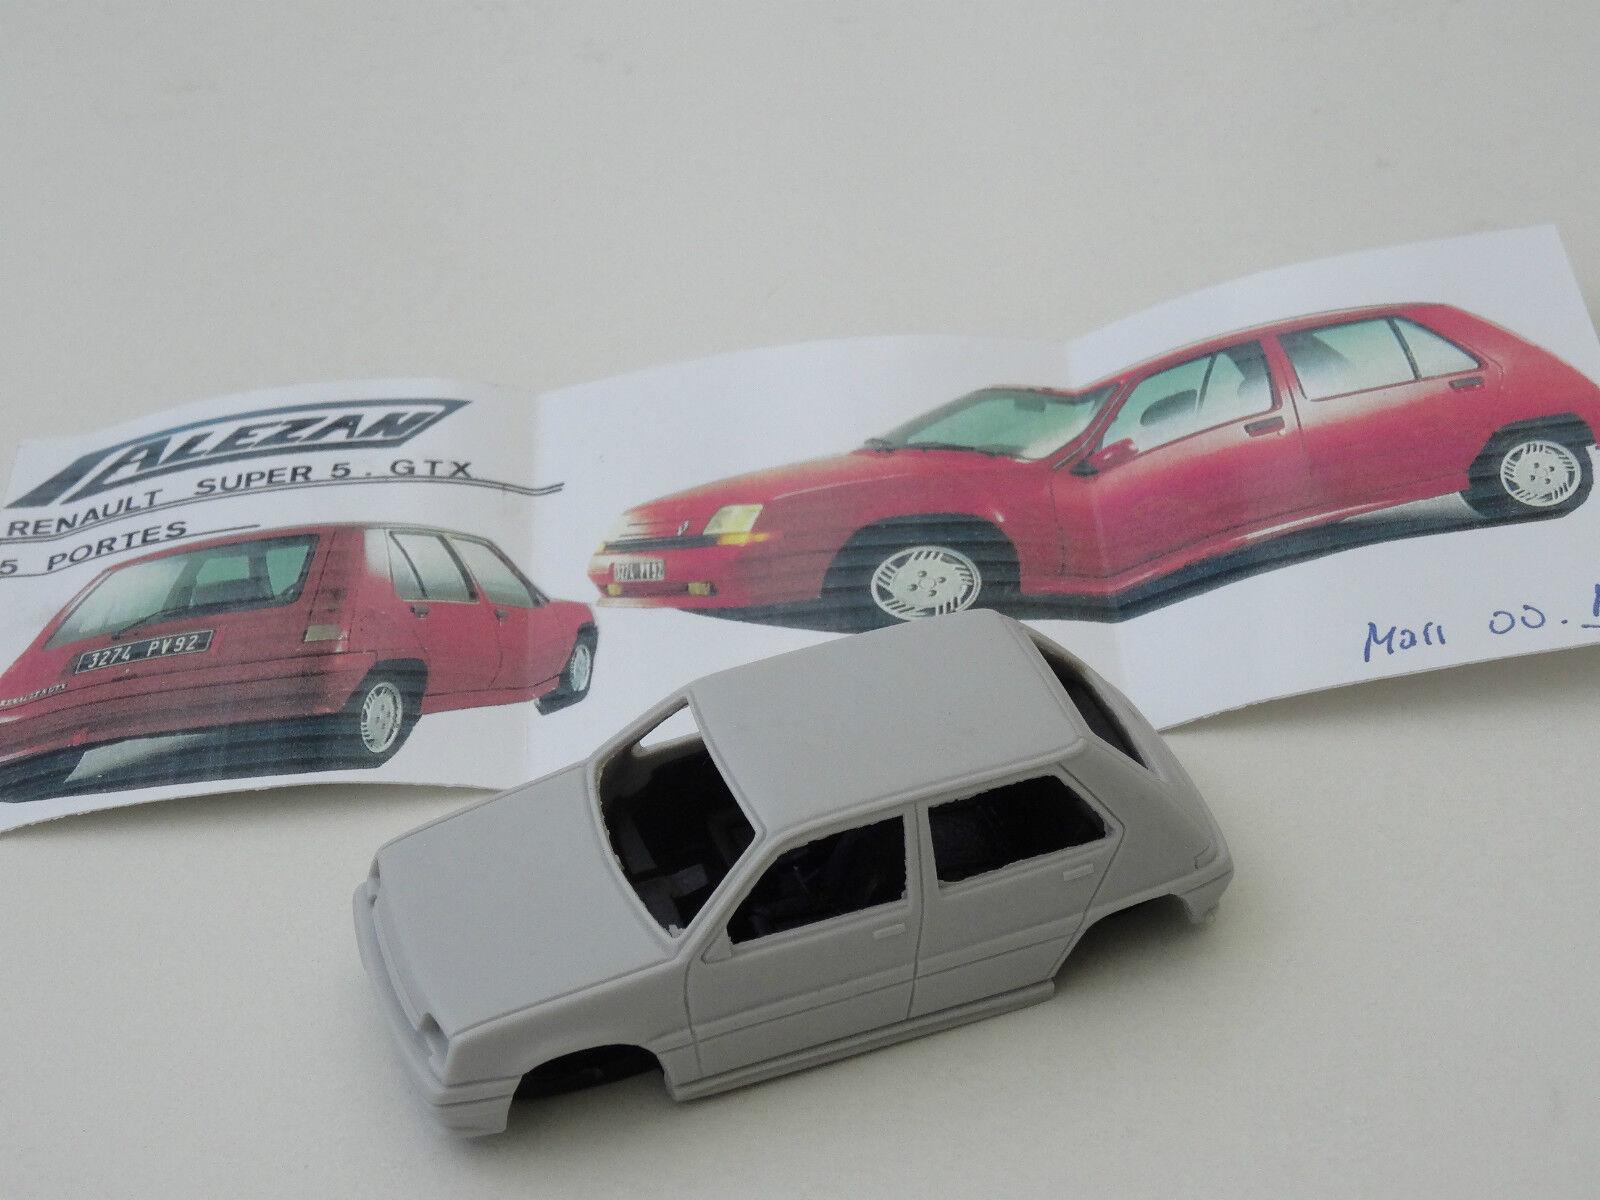 Chestnut models. 1 43. renault super 5 gtx GTS. 5 doors. 1988.